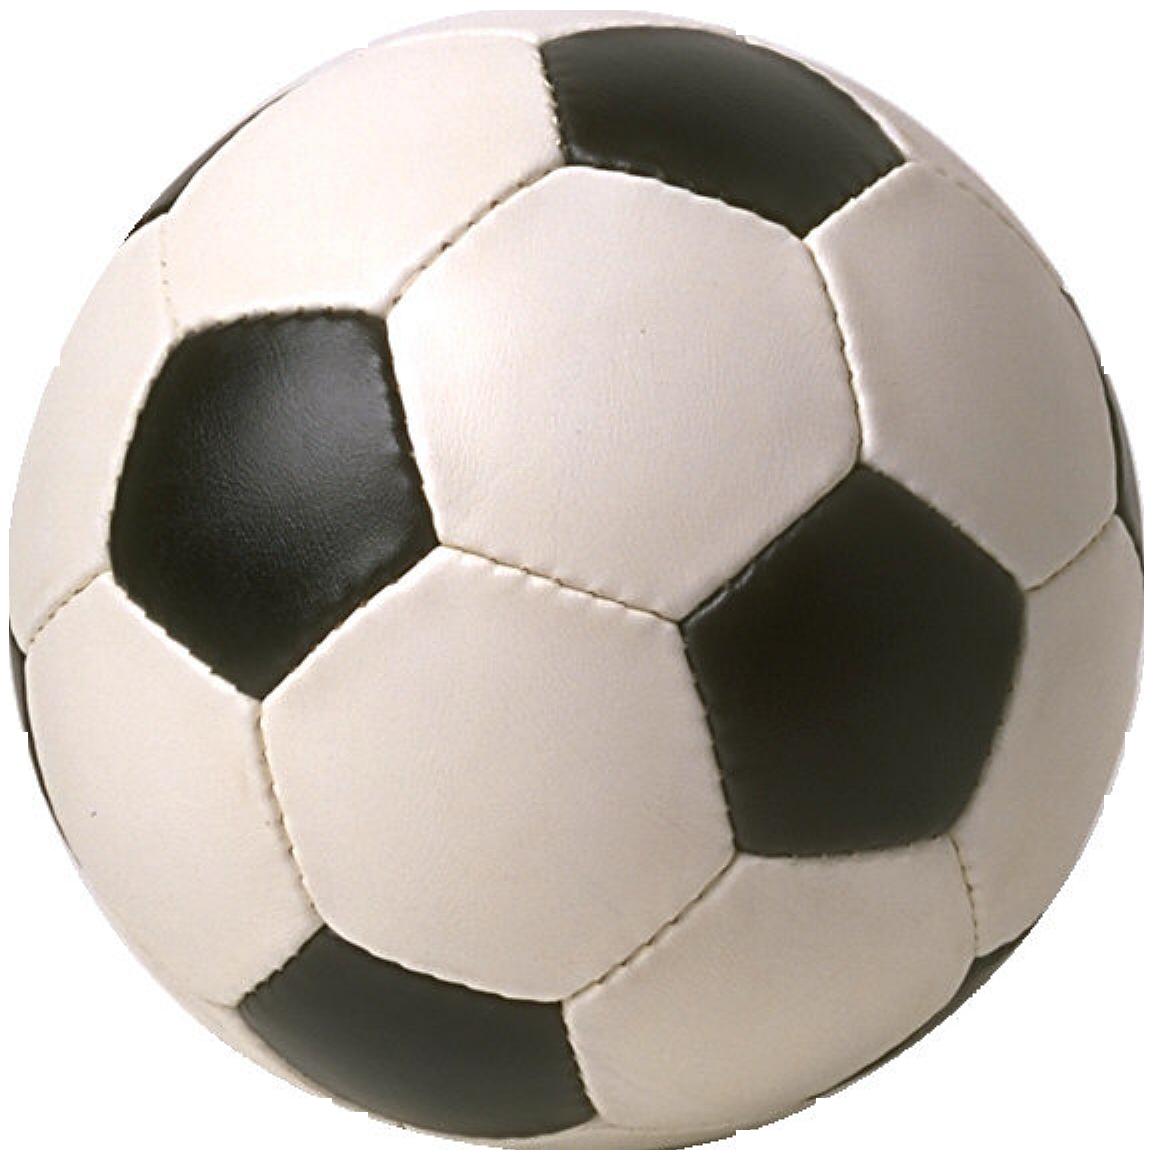 Football ball PNG image - Football PNG